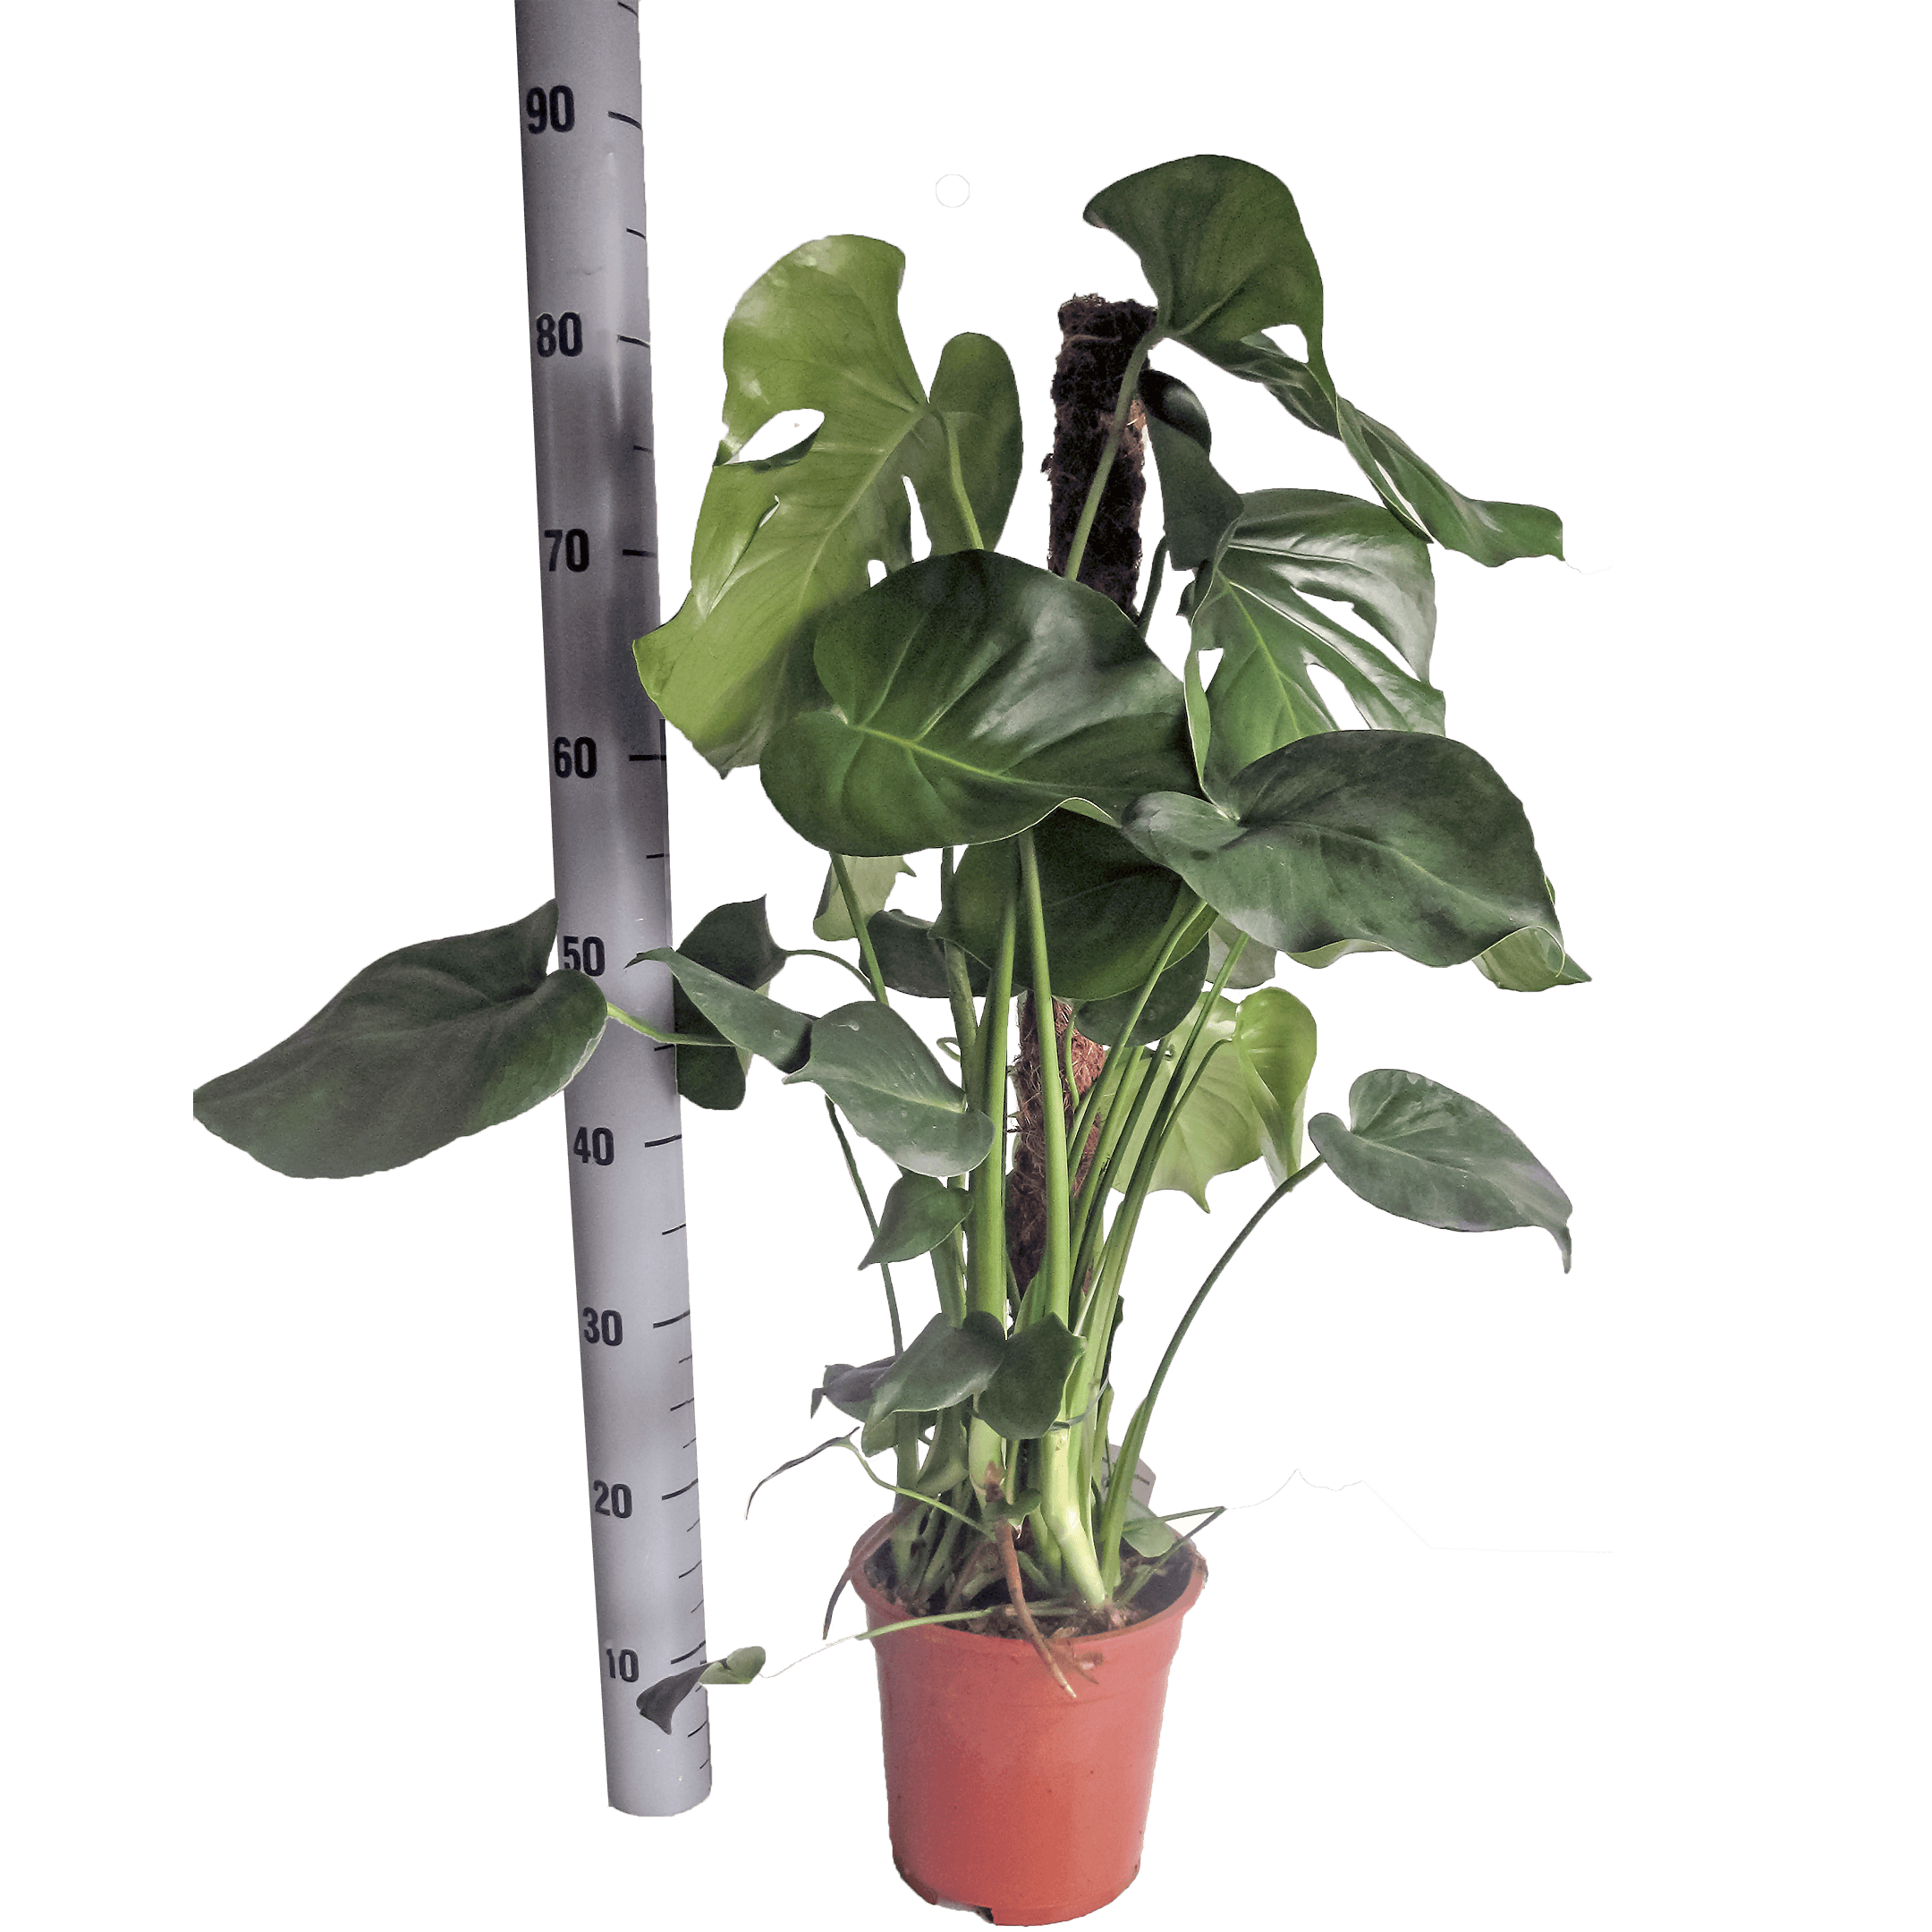 Photo: Monstera deliciosa (Swiss cheese plant) in pot with 17 cm diameter.